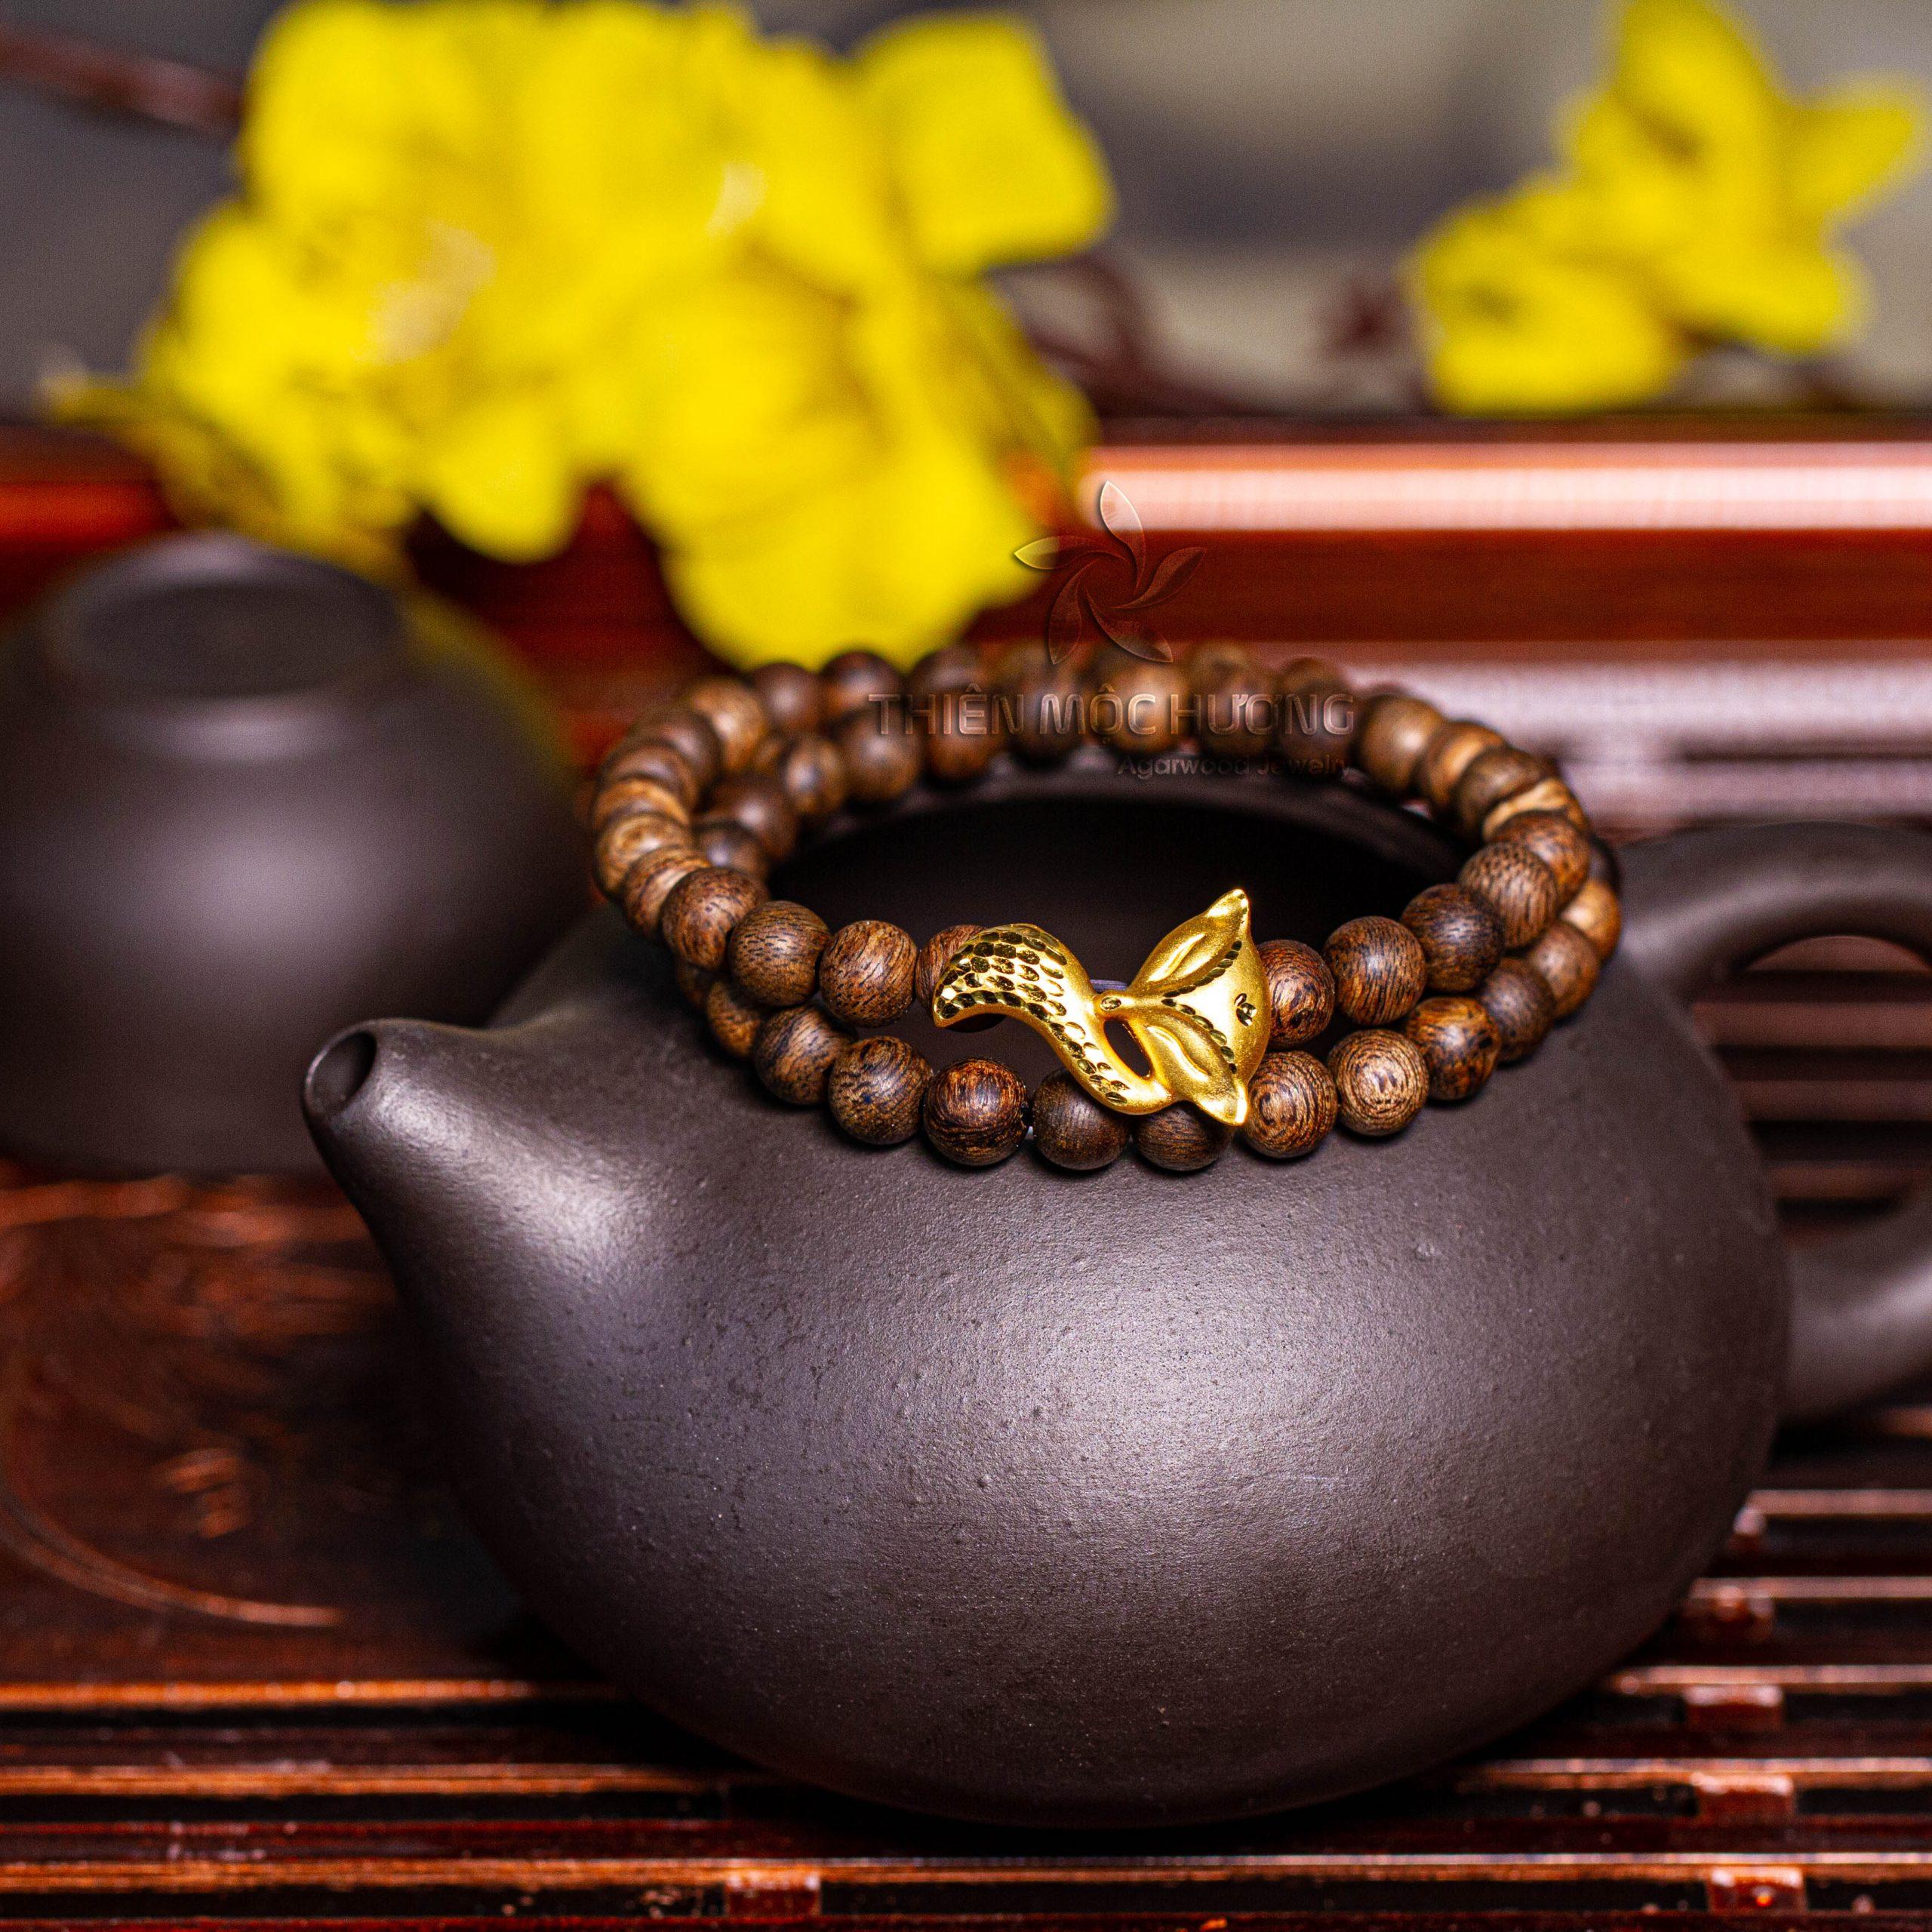 Philippines nine-tailed fox agarwood beaded bracelet with 24k gold charm - premium